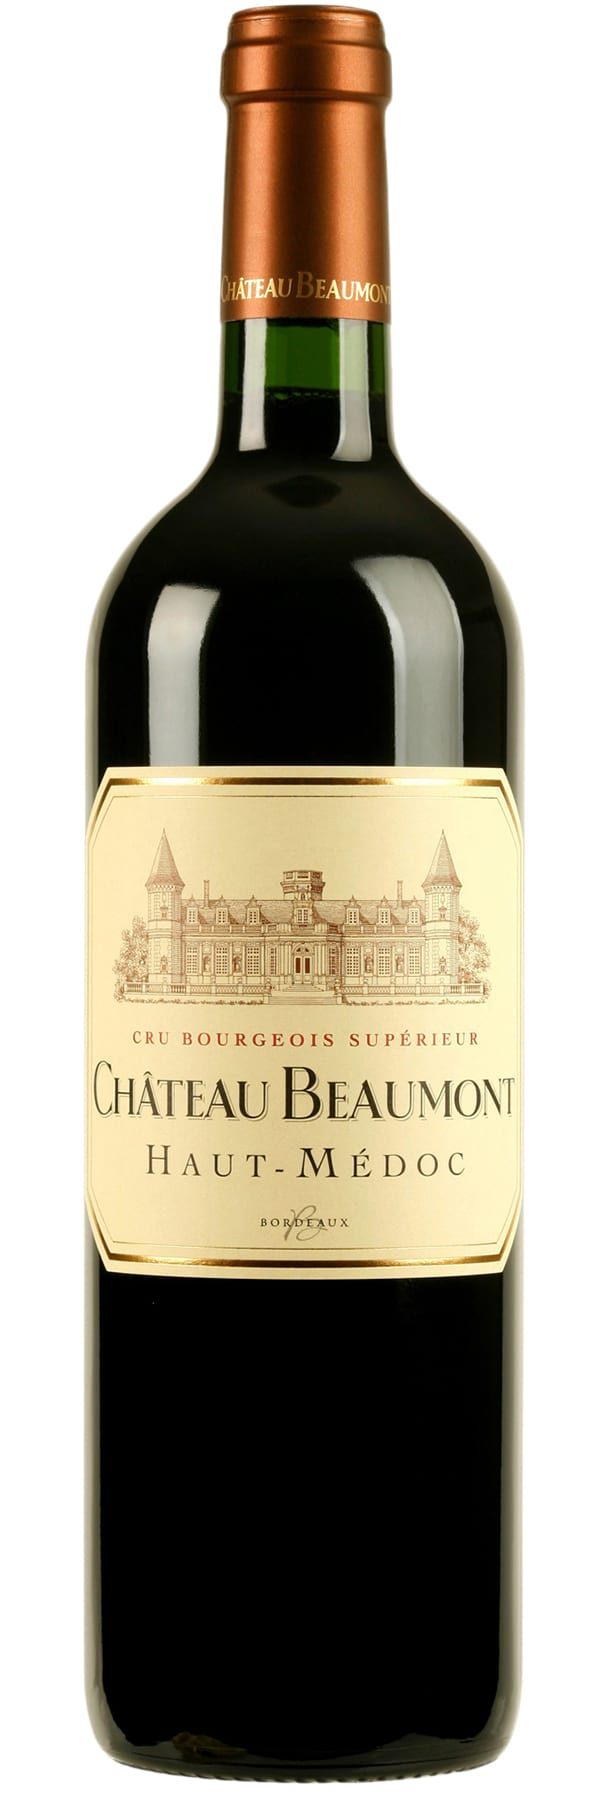 2011 Chateau Beaumont Haut-Medoc 1.5 liter фото